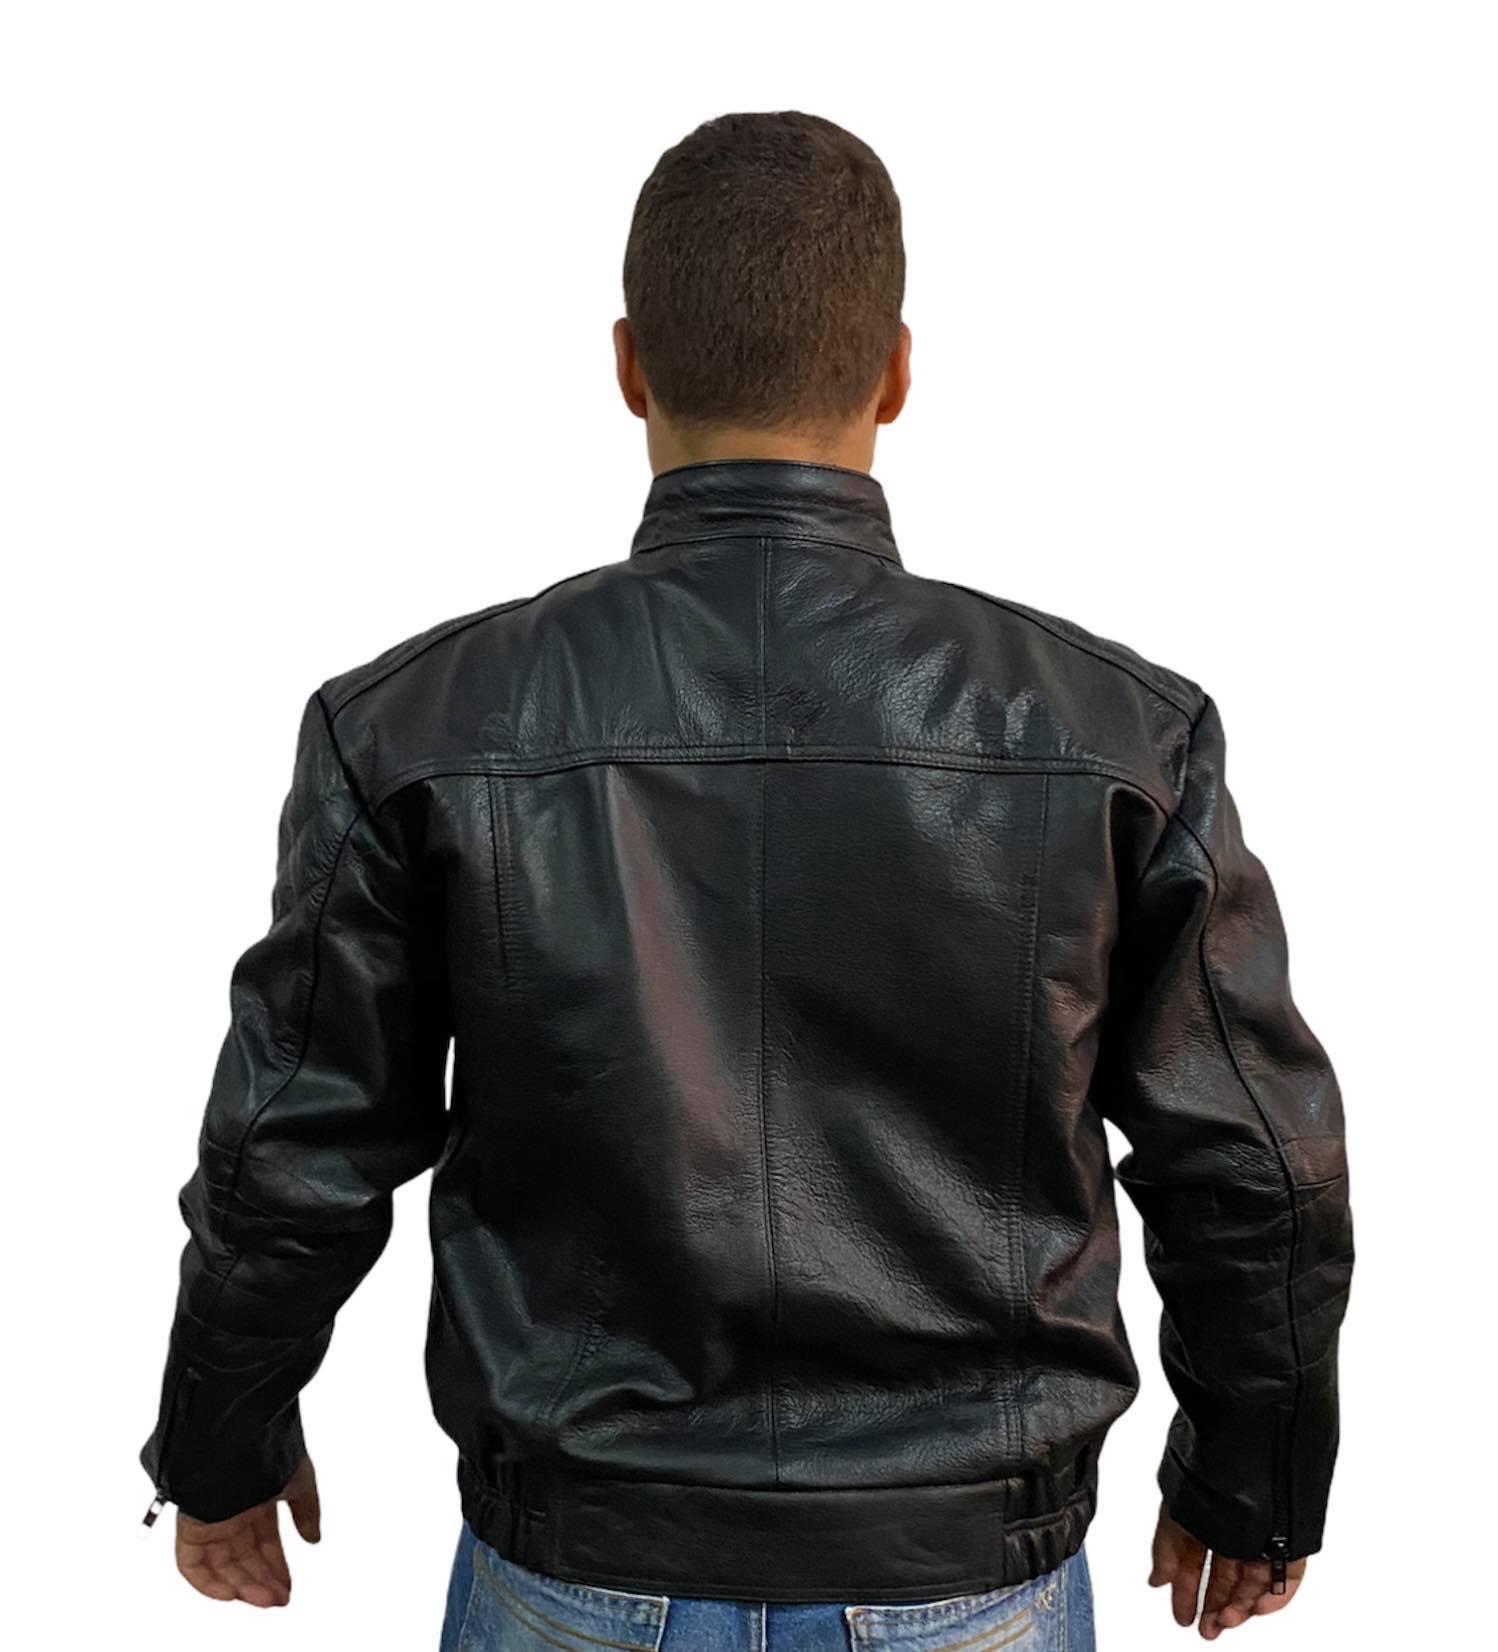 Jaqueta Masculina Prata Couro 354 Fênix Preta Motociclista